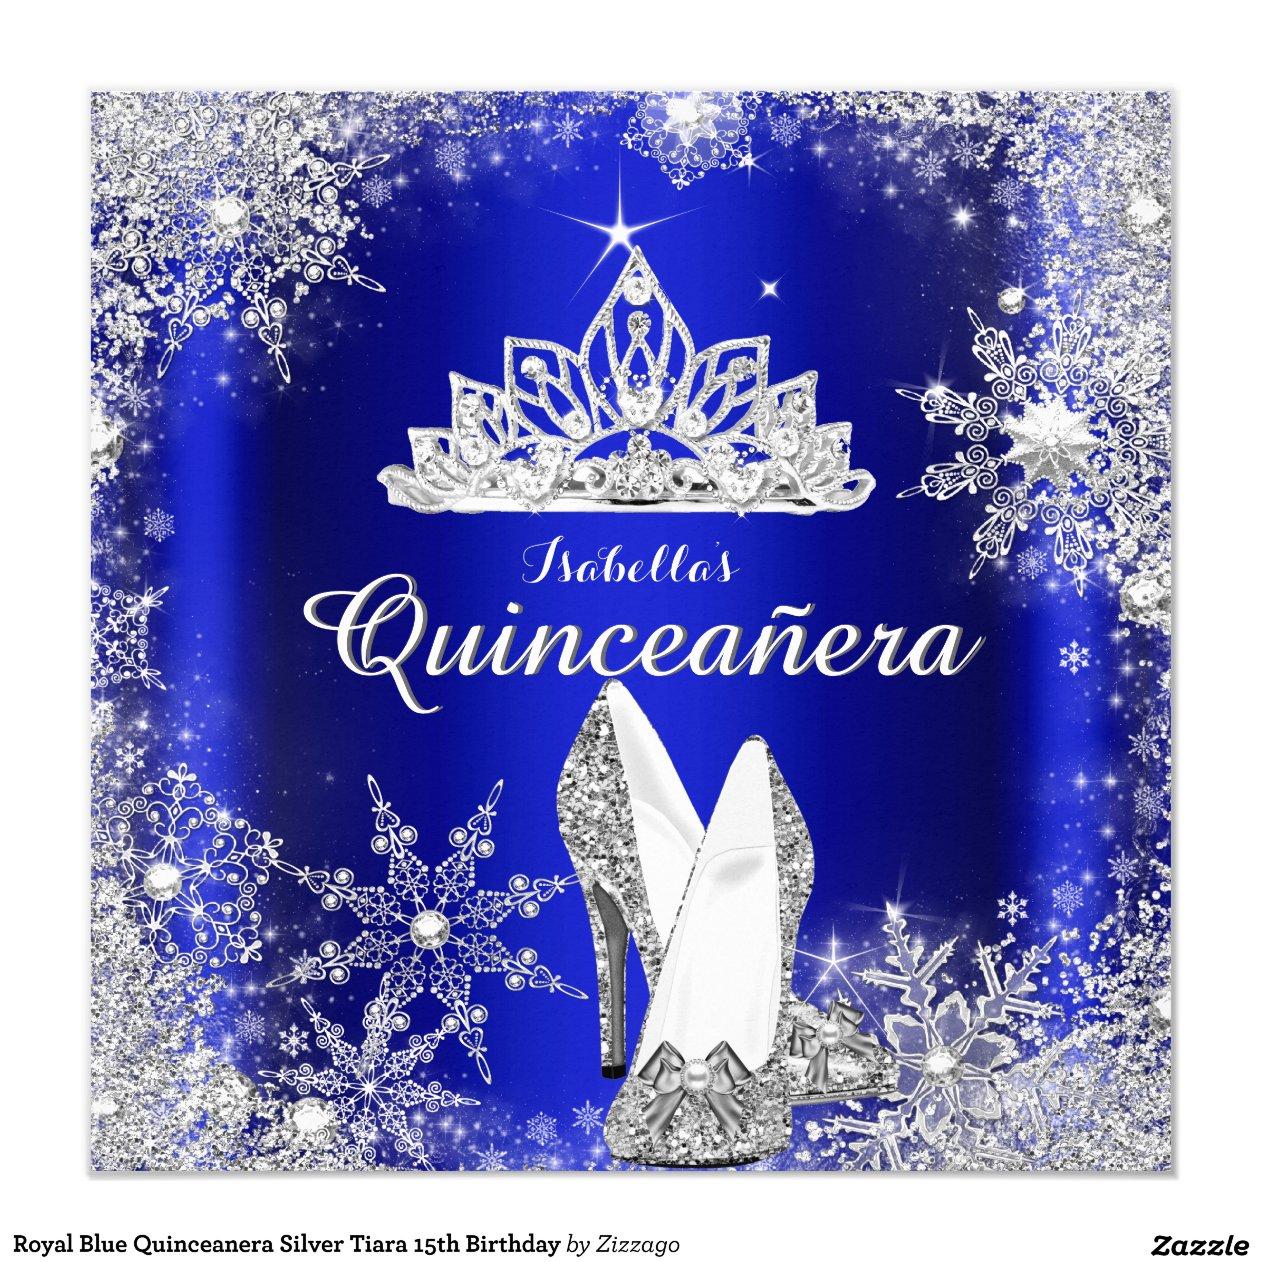 royal_blue_quinceanera_silver_tiara_15th_birthday ...